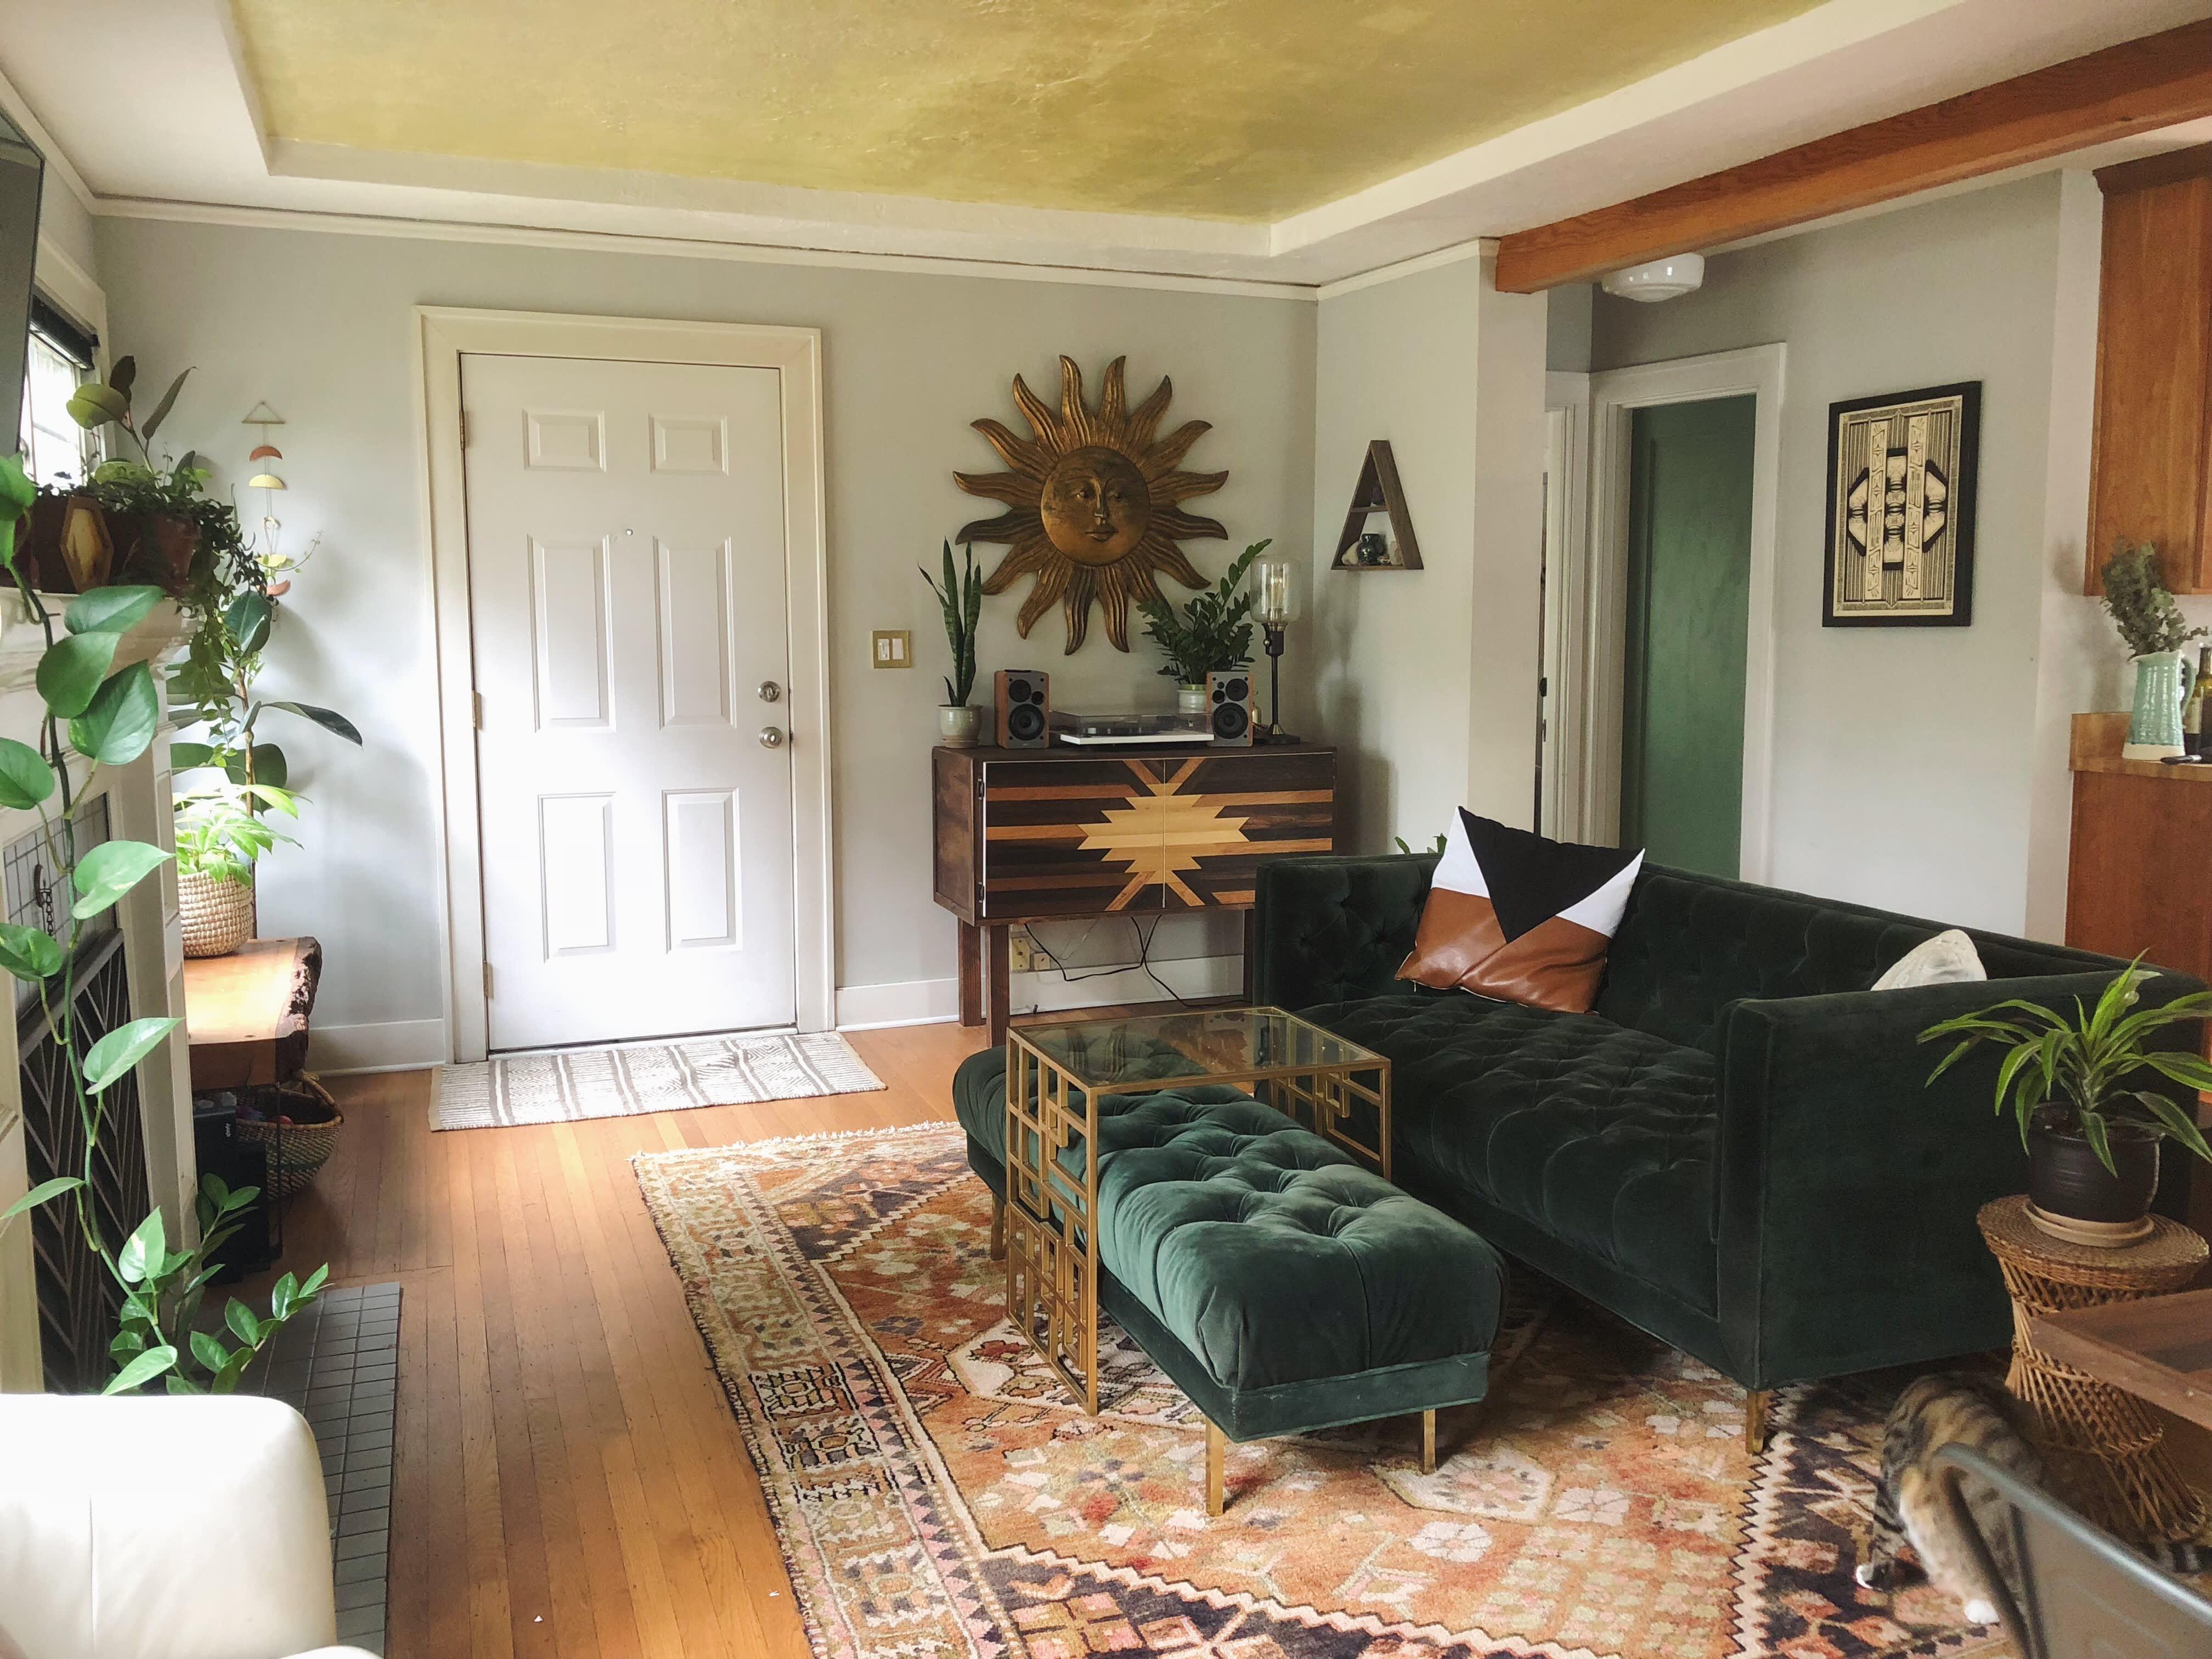 An Art Forward Funky Vintage Portland Bungalow Funky Home Decor Apartment Decor Home Interior Design